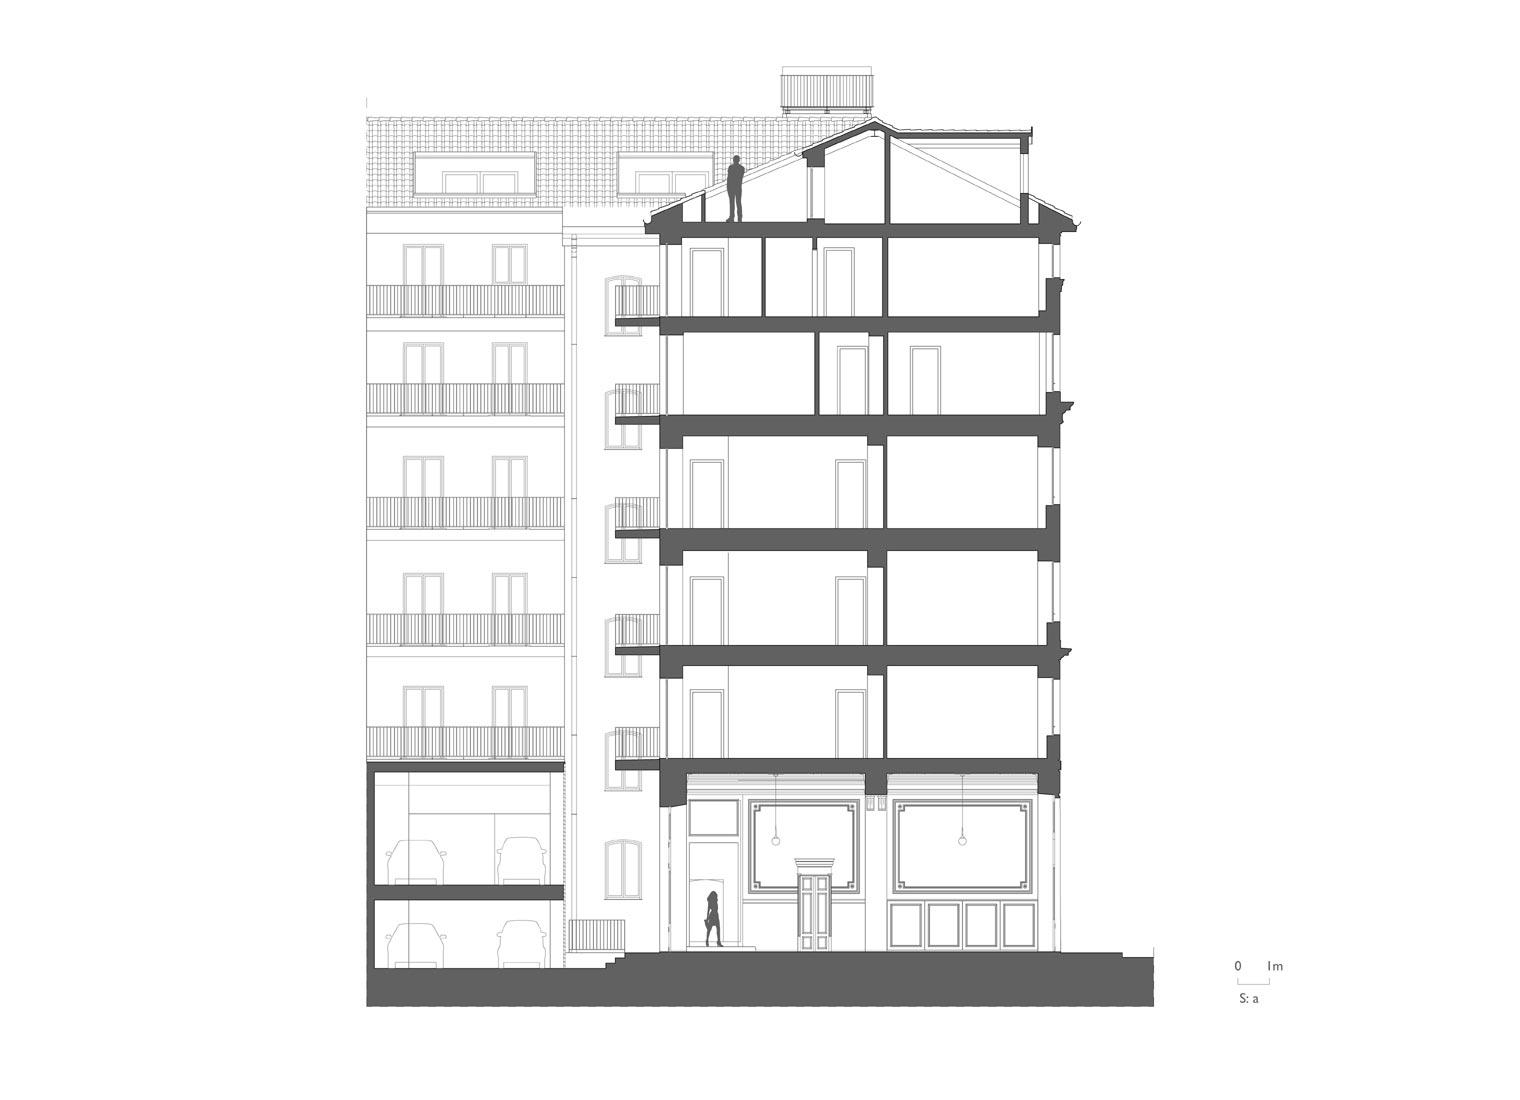 vk-architetti_belvedere_sez